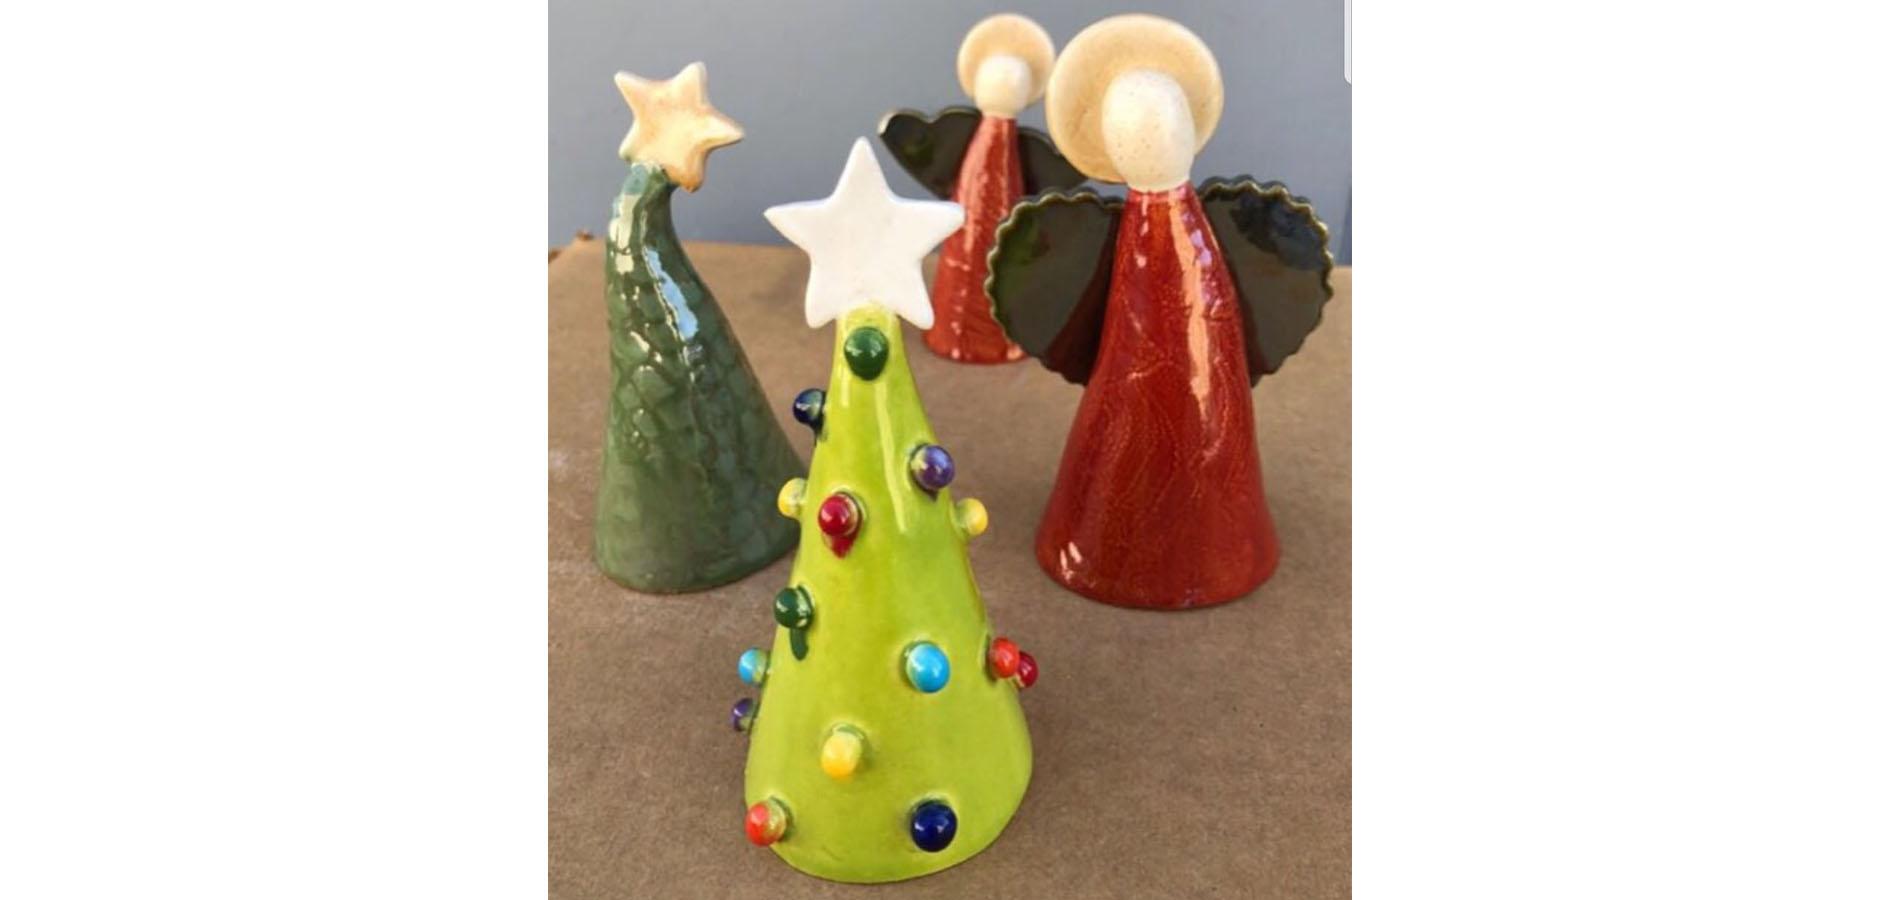 Ceramic Holiday Art!